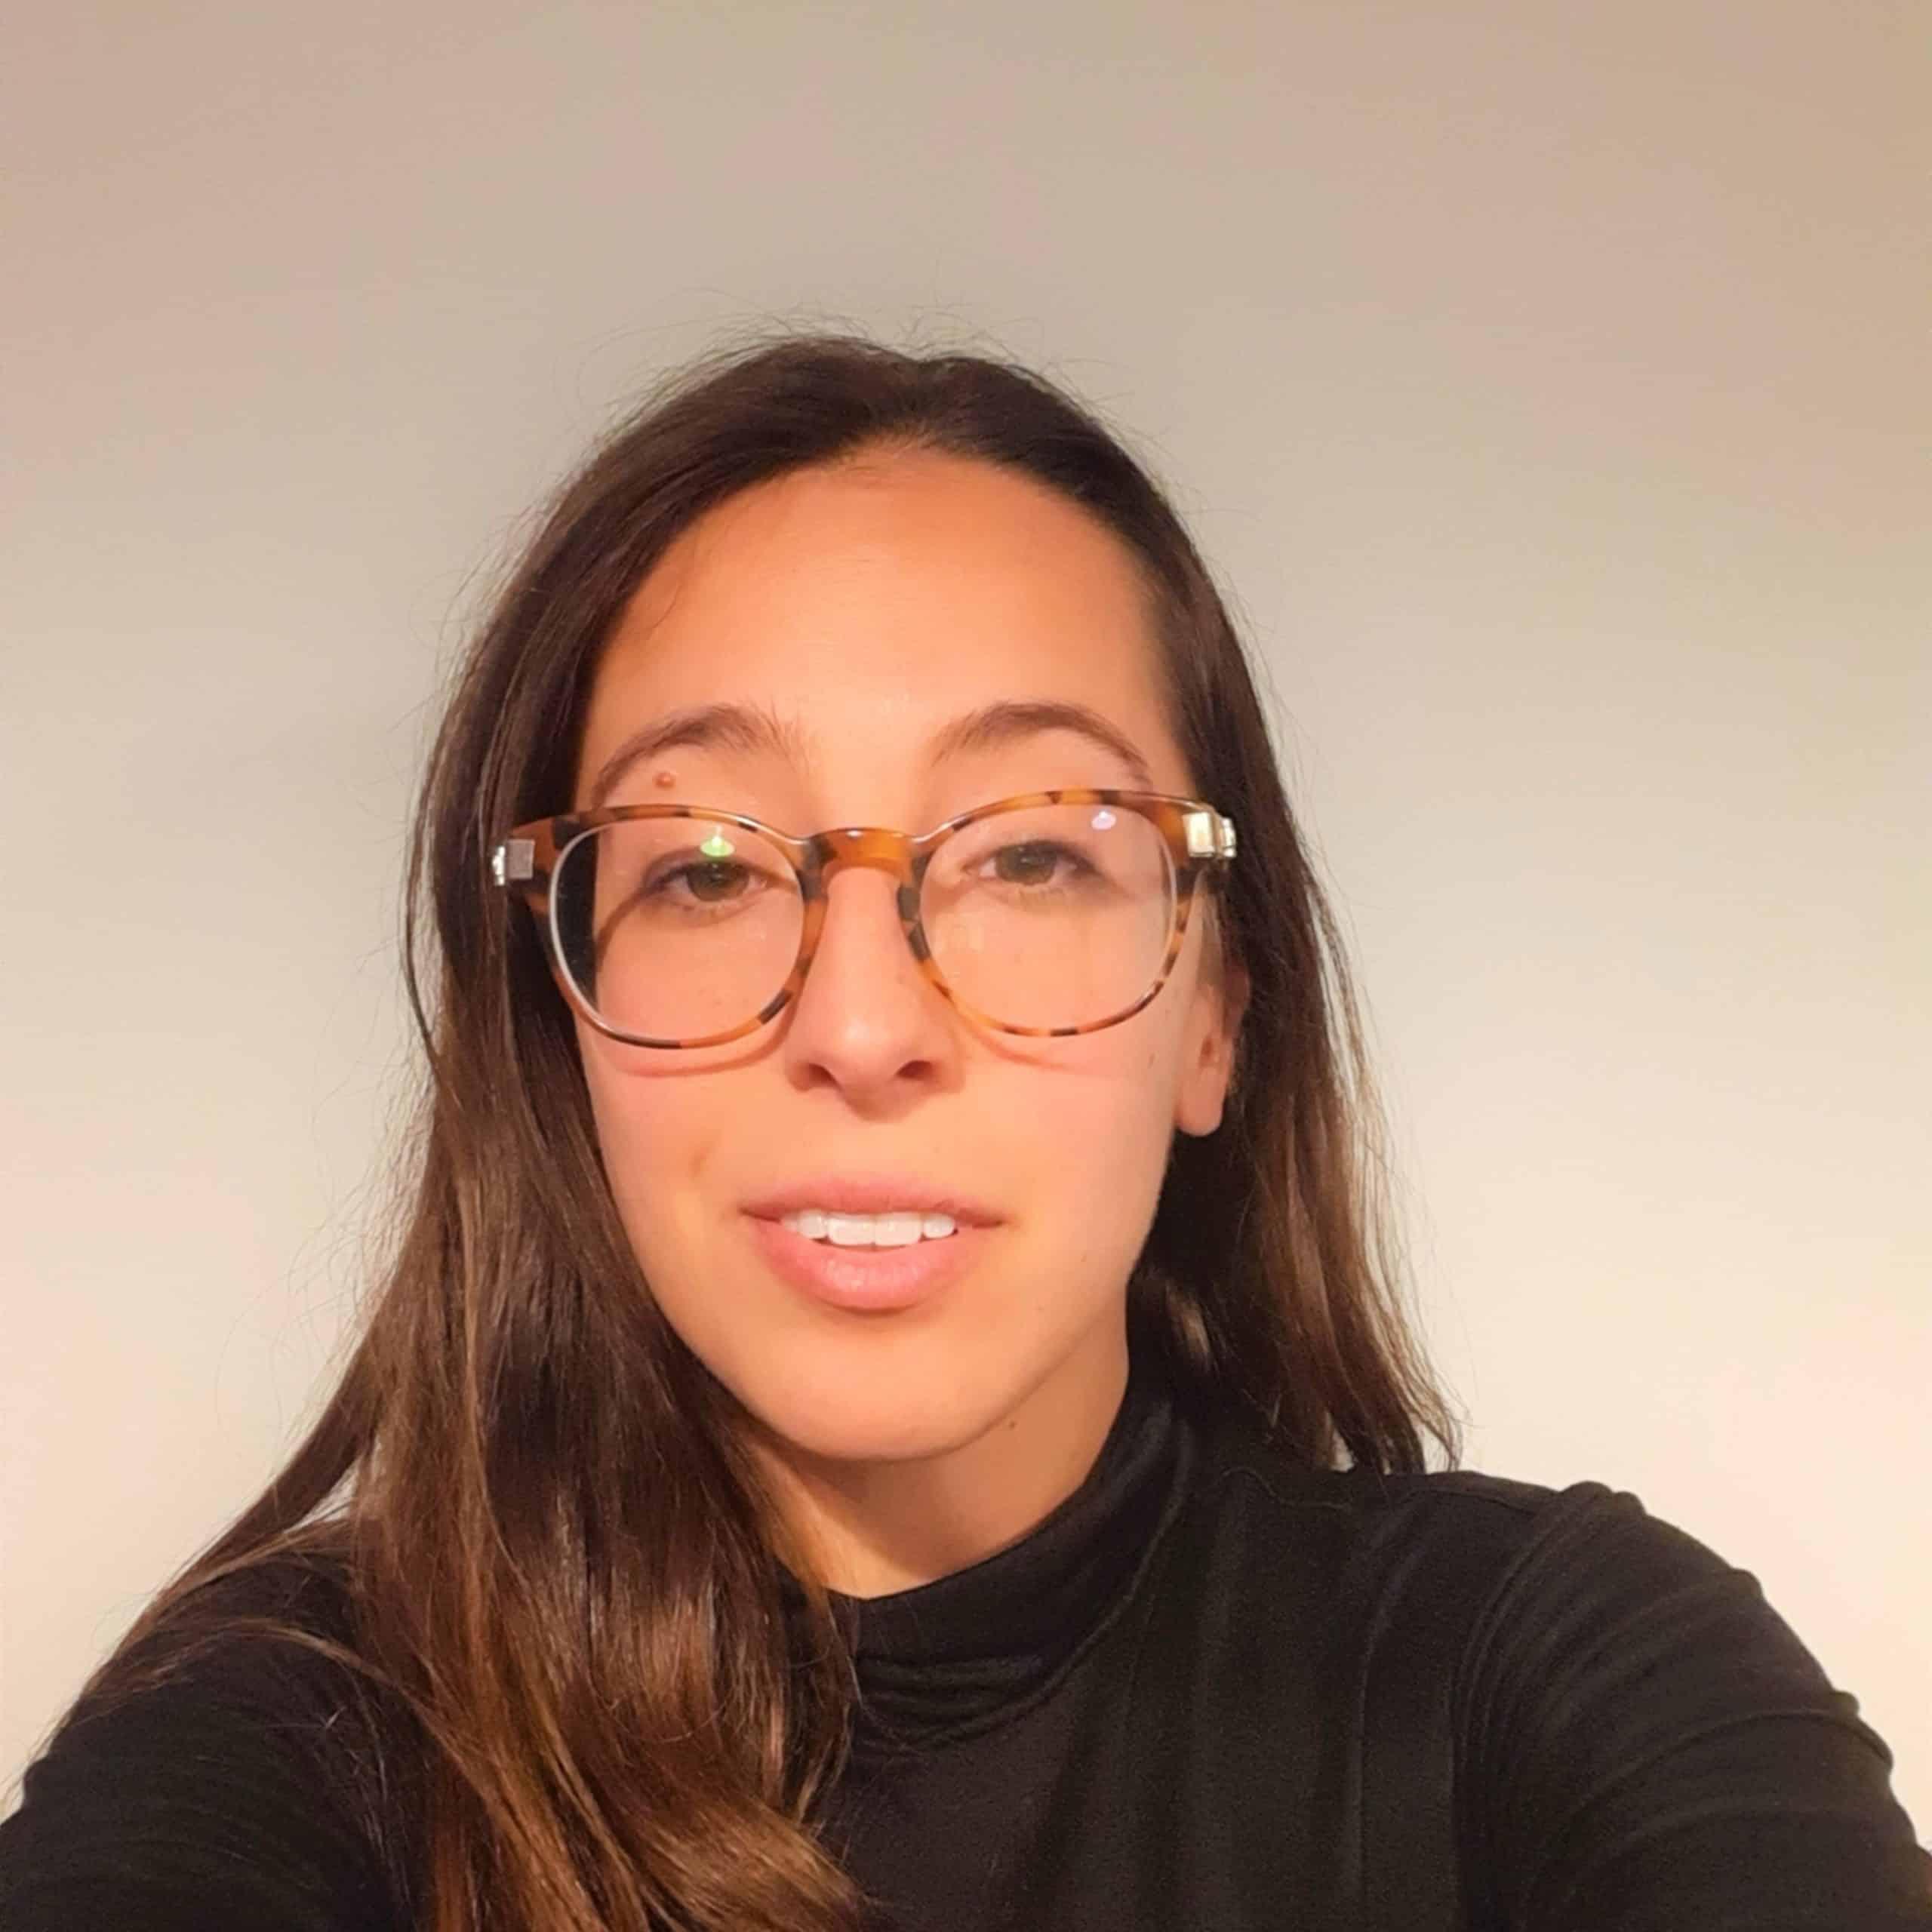 Abigail Levner, Communication and Marketing Coordinator